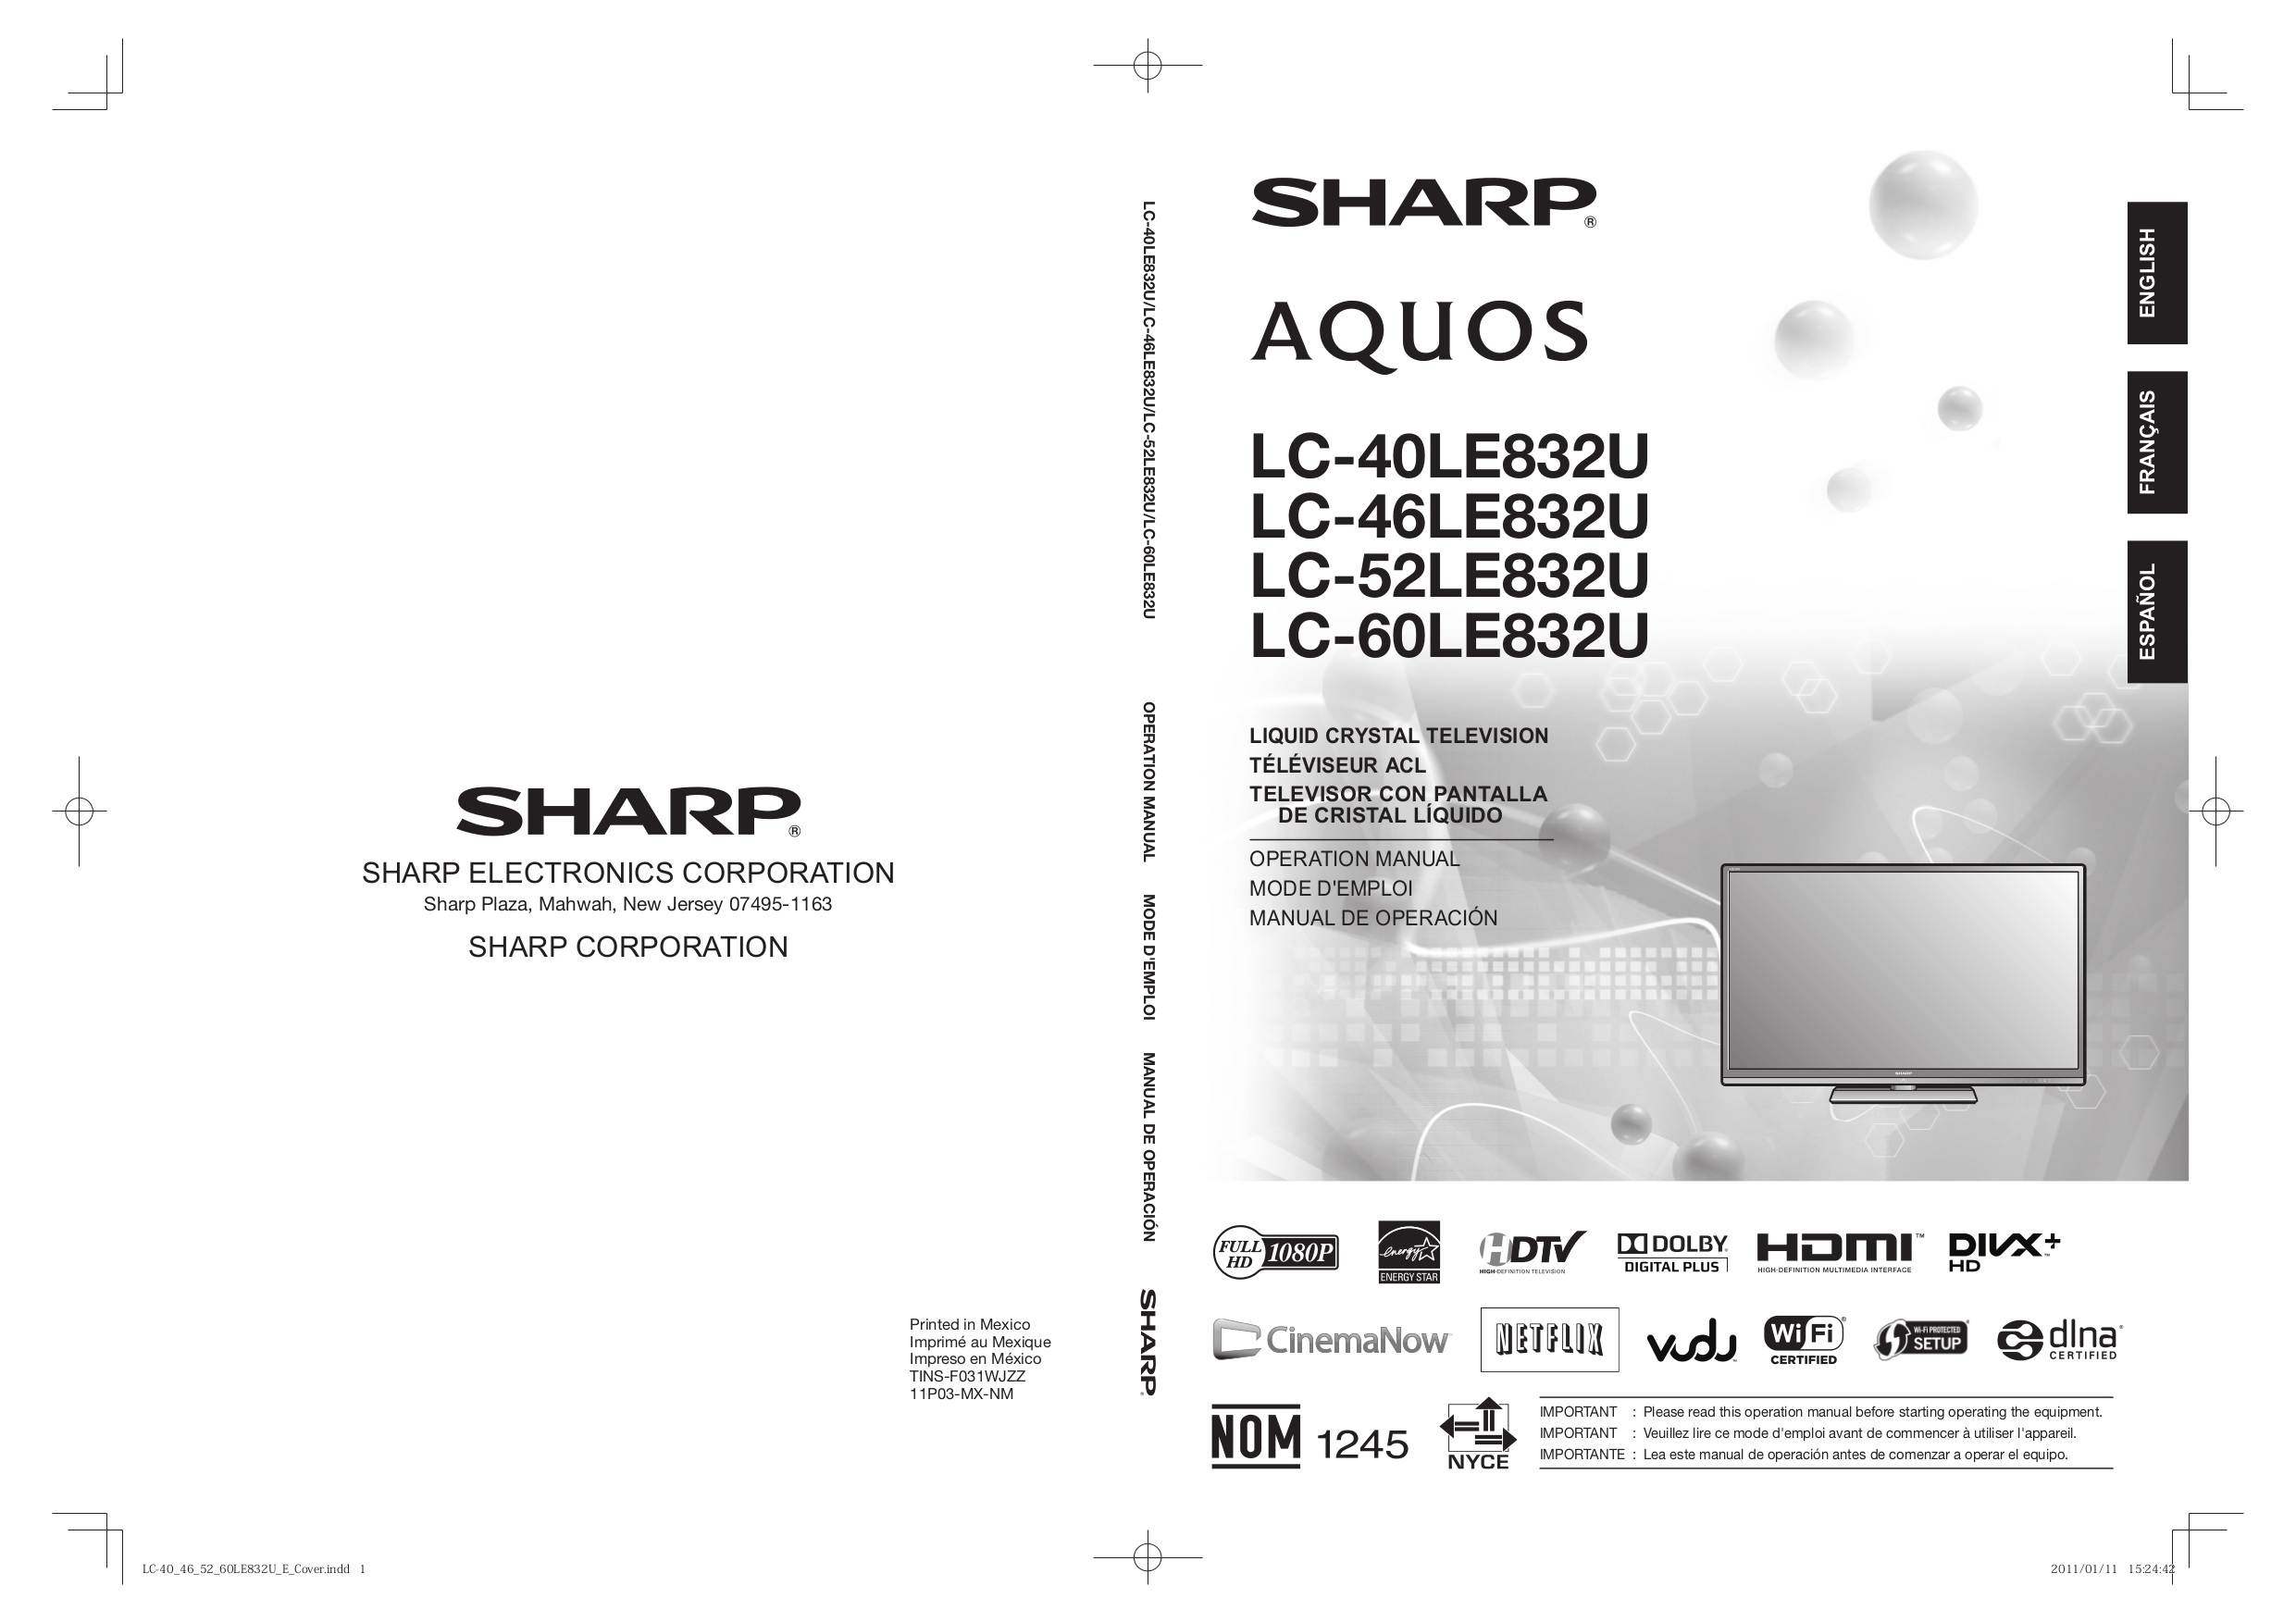 download free pdf for sharp aquos lc 40e67u tv manual rh umlib com Sony PRS-600 User Manual Sharp Operation Manuals